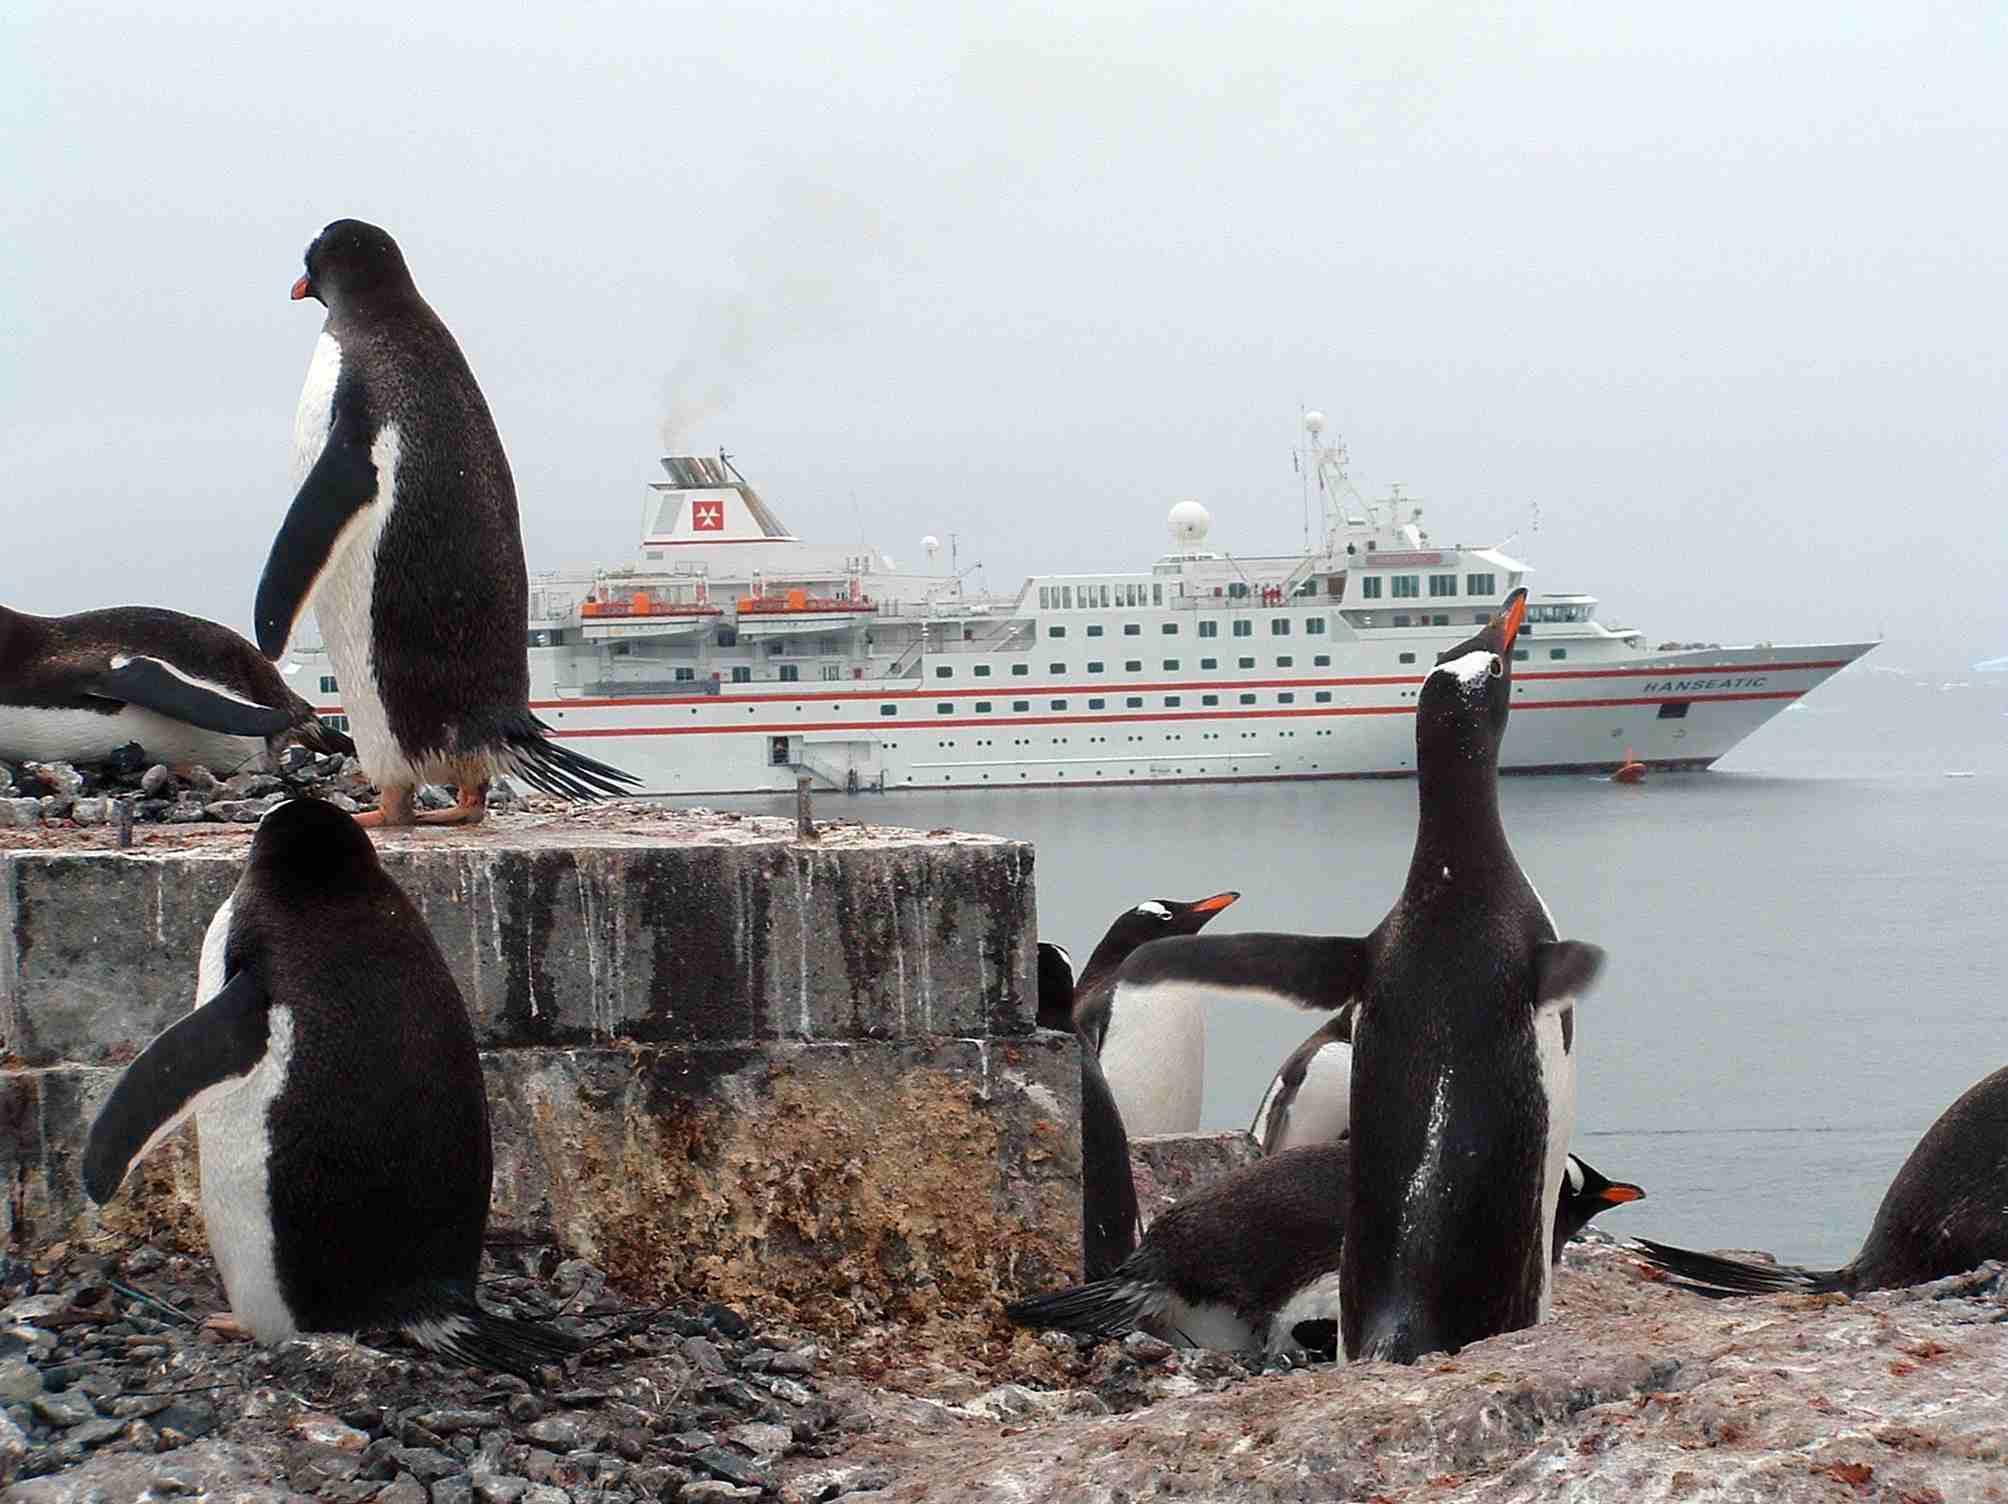 25 Penguin Photos from Antarctica